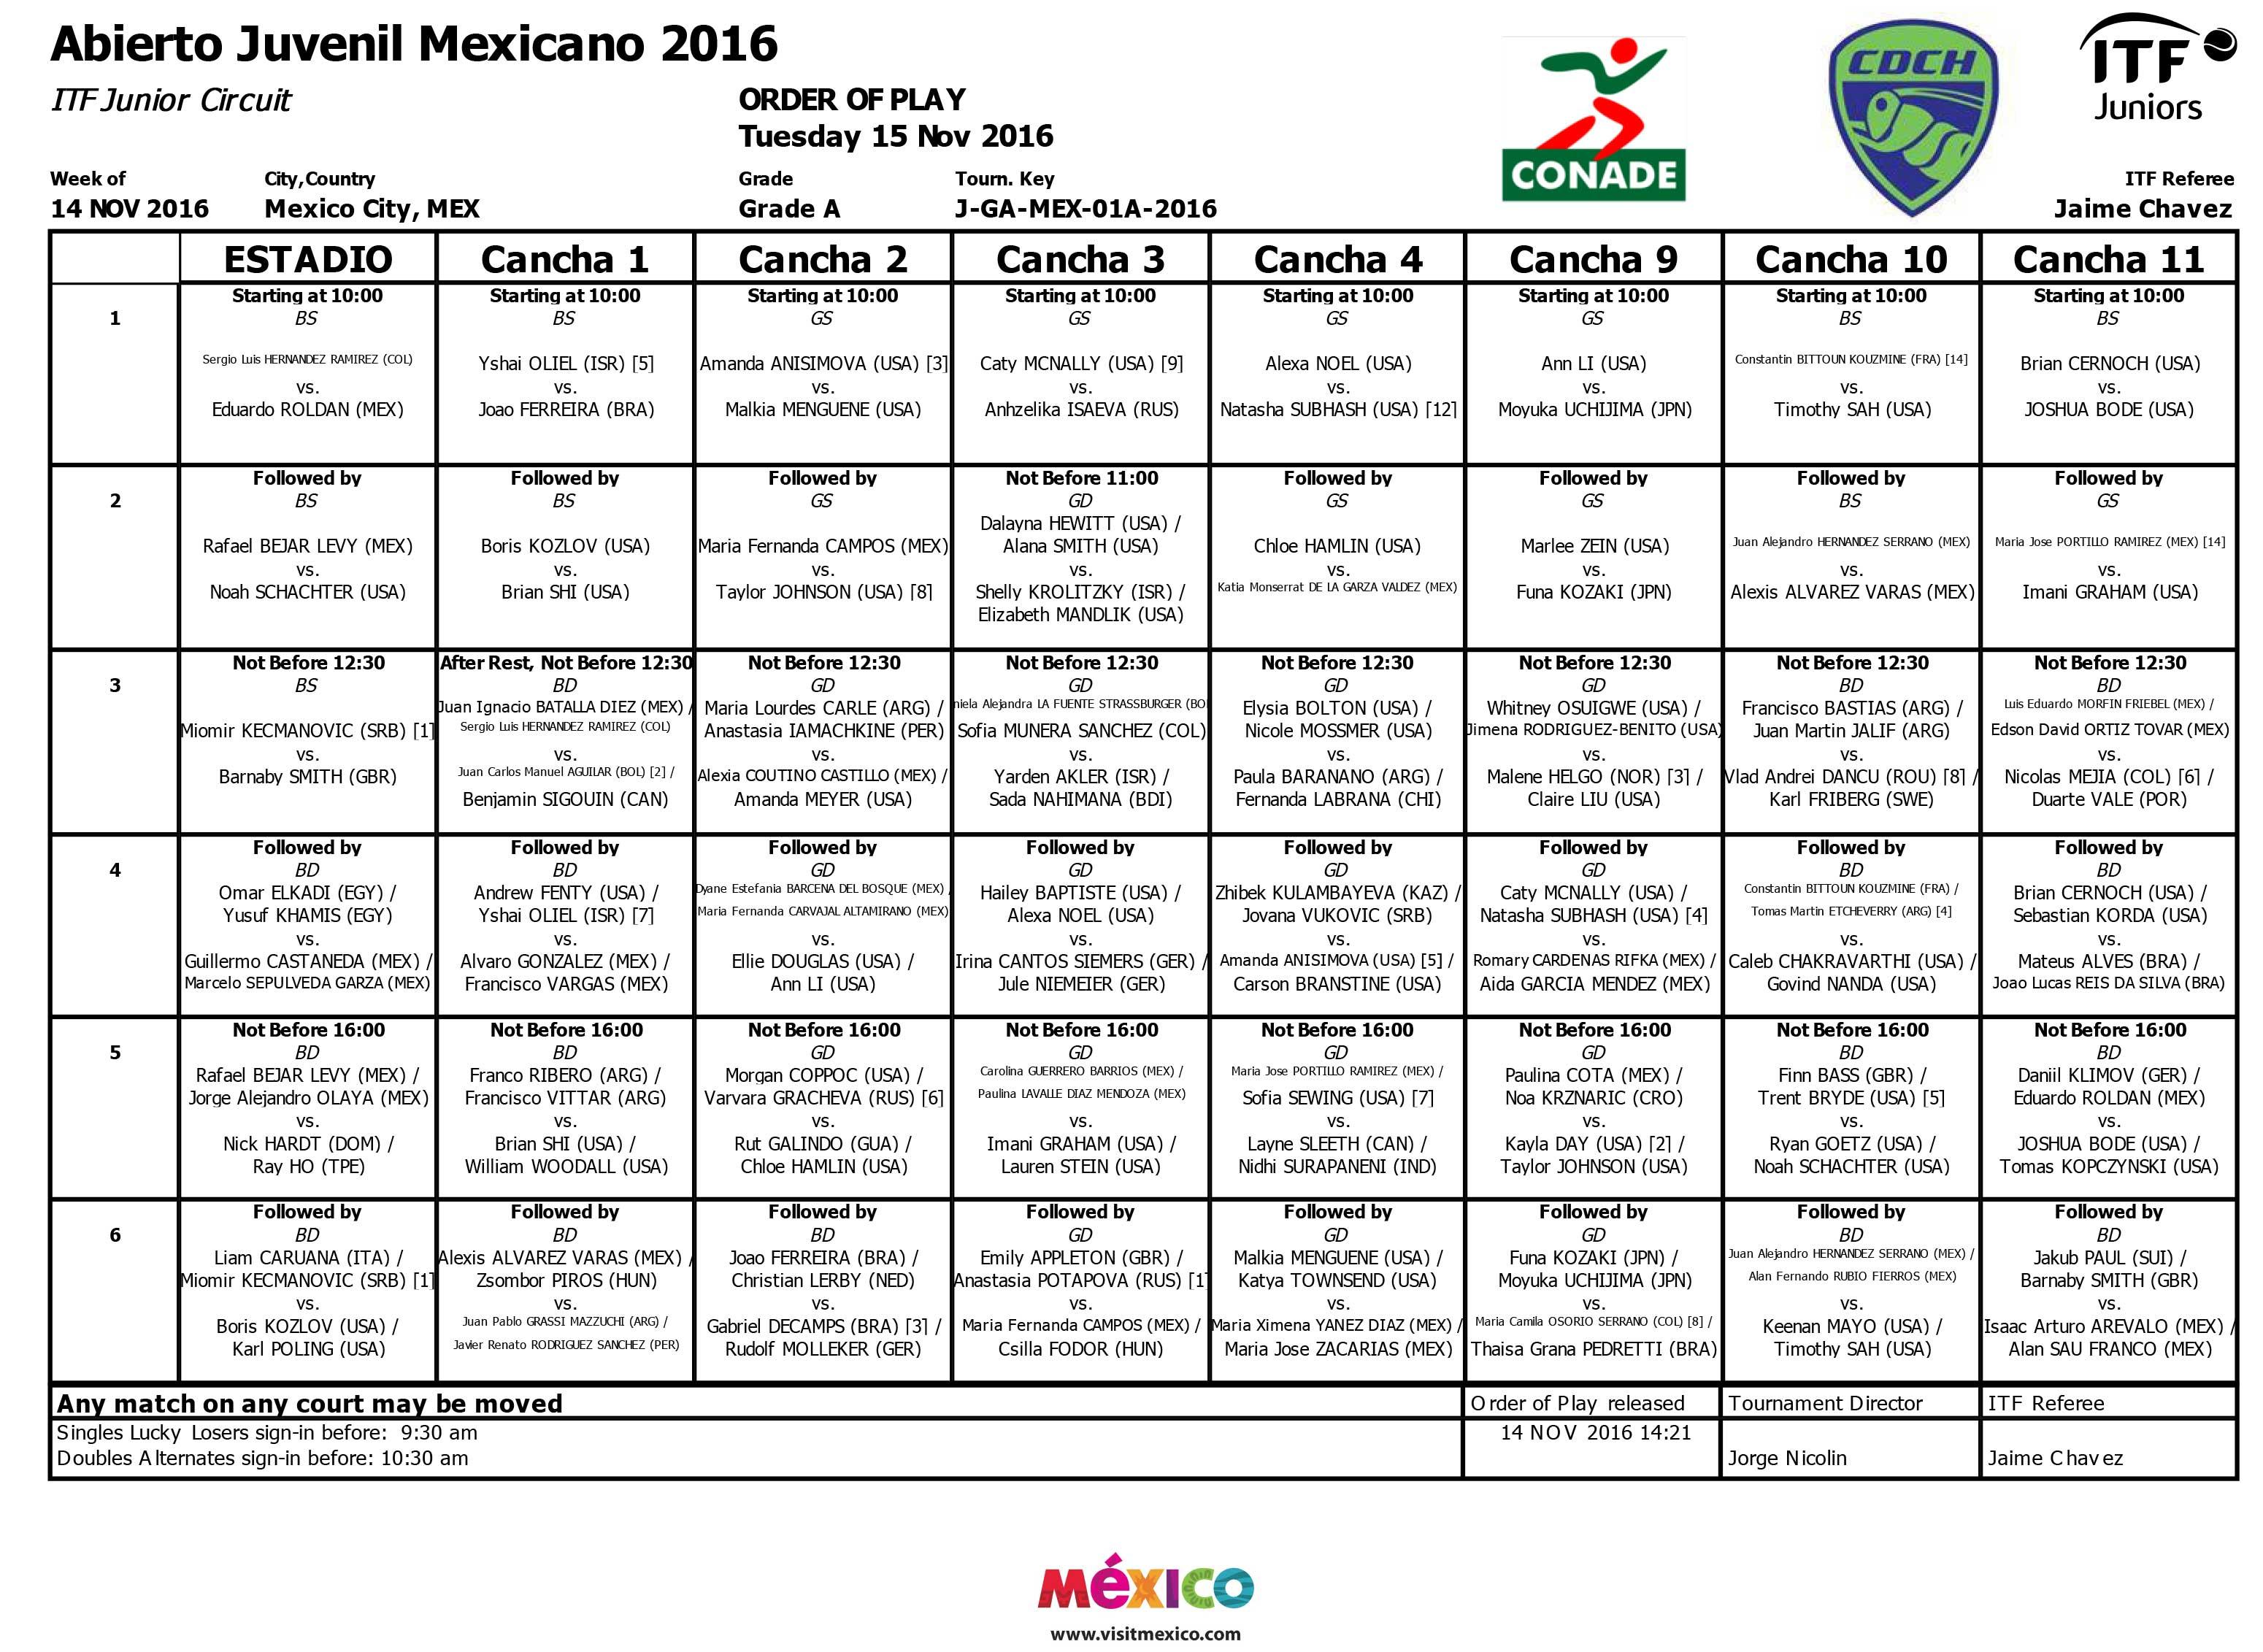 2-draws-fmt-2016-1